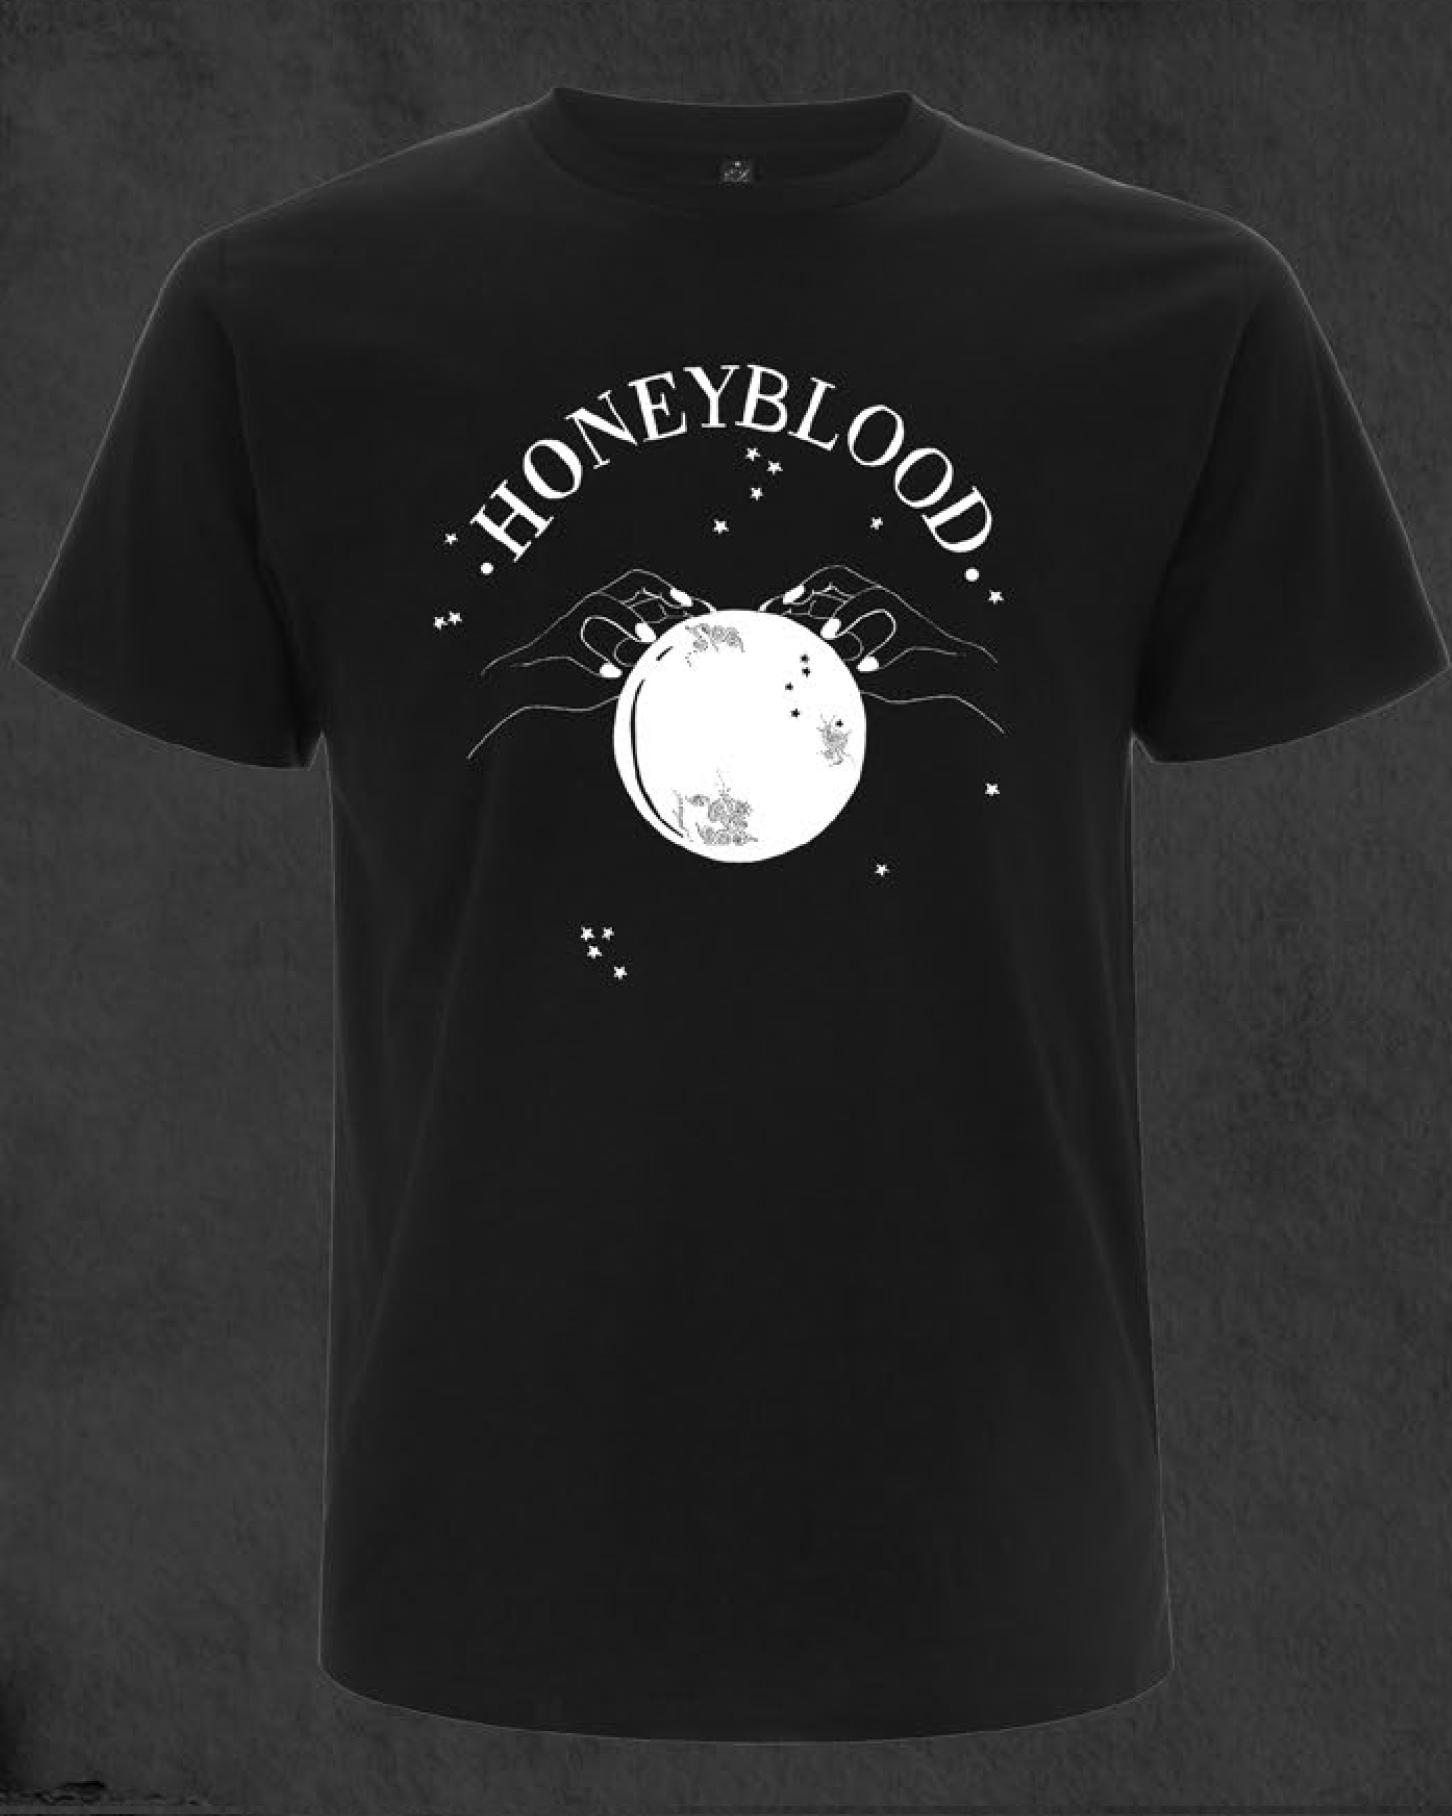 'Ready For The Magic' T-shirt (Black)